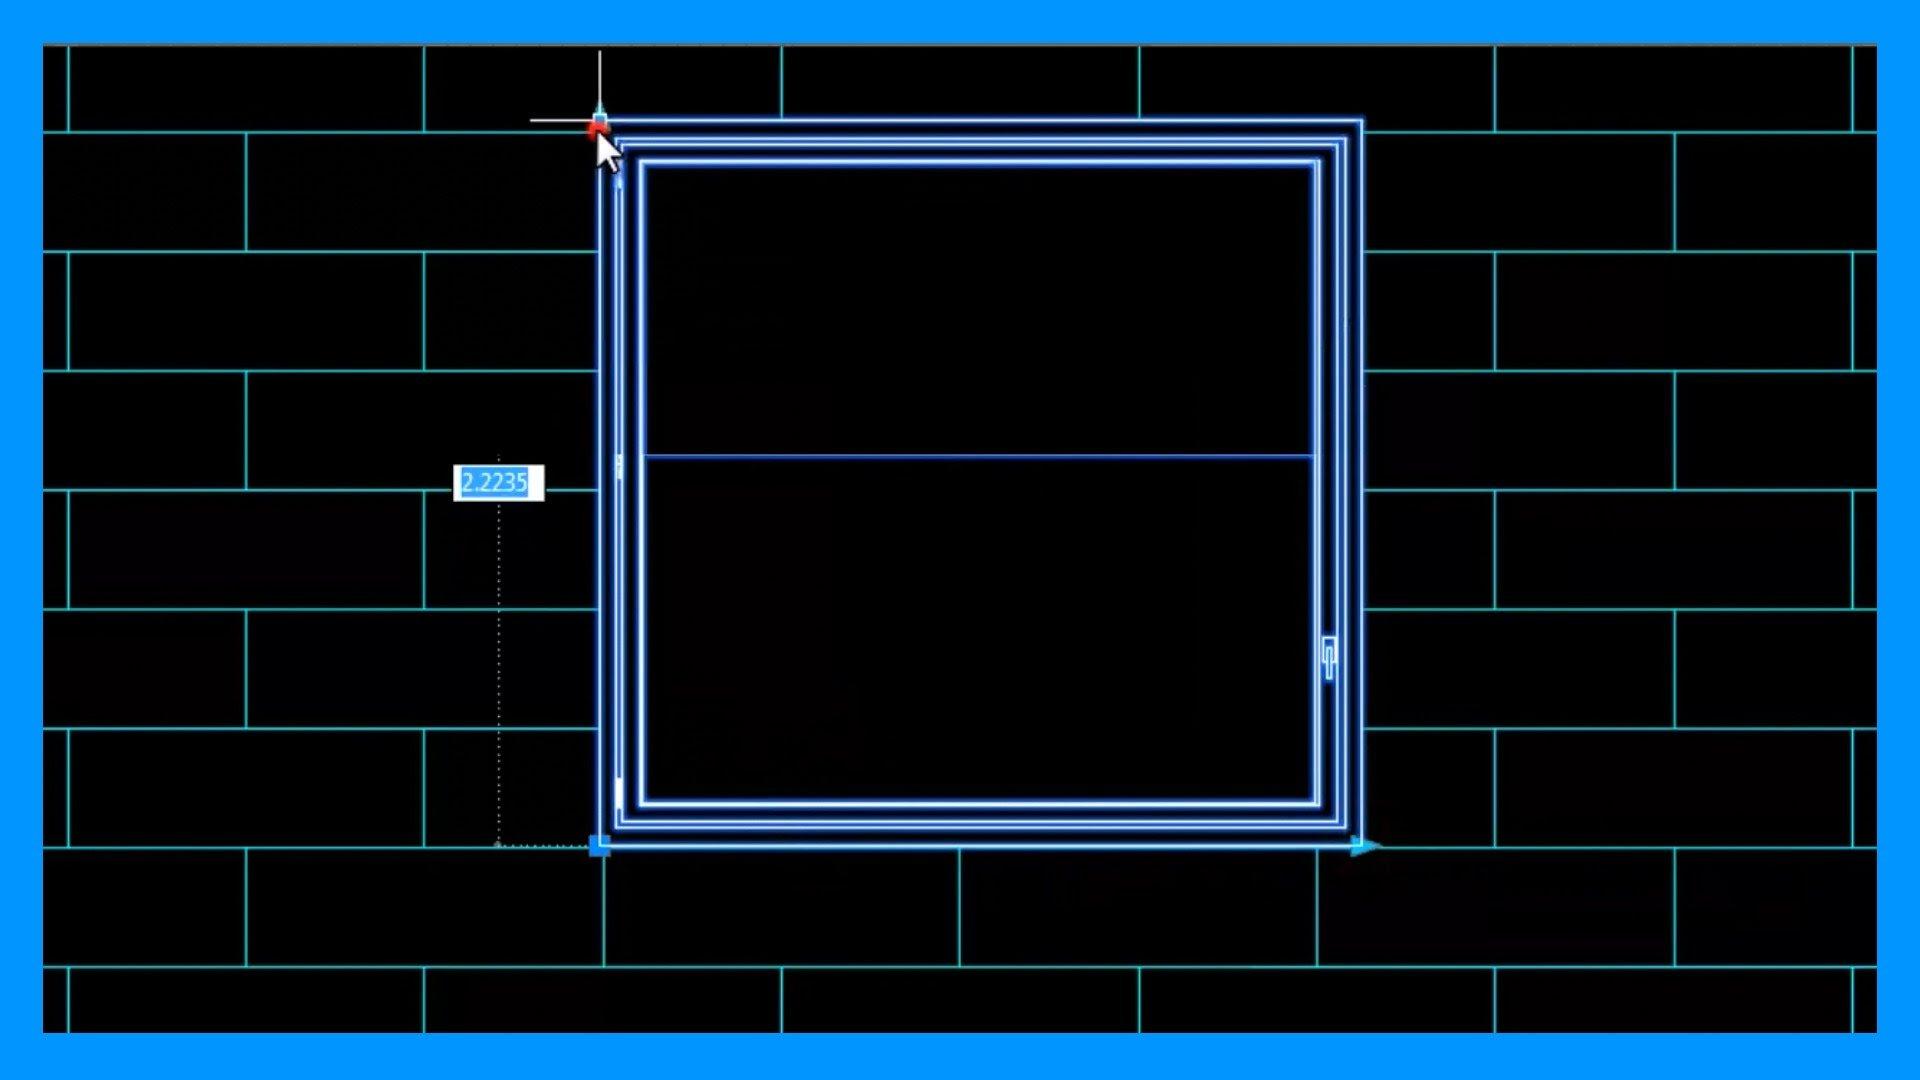 Autocad – Bloques dinámicos, ventana dinámica, modificar dimensiones